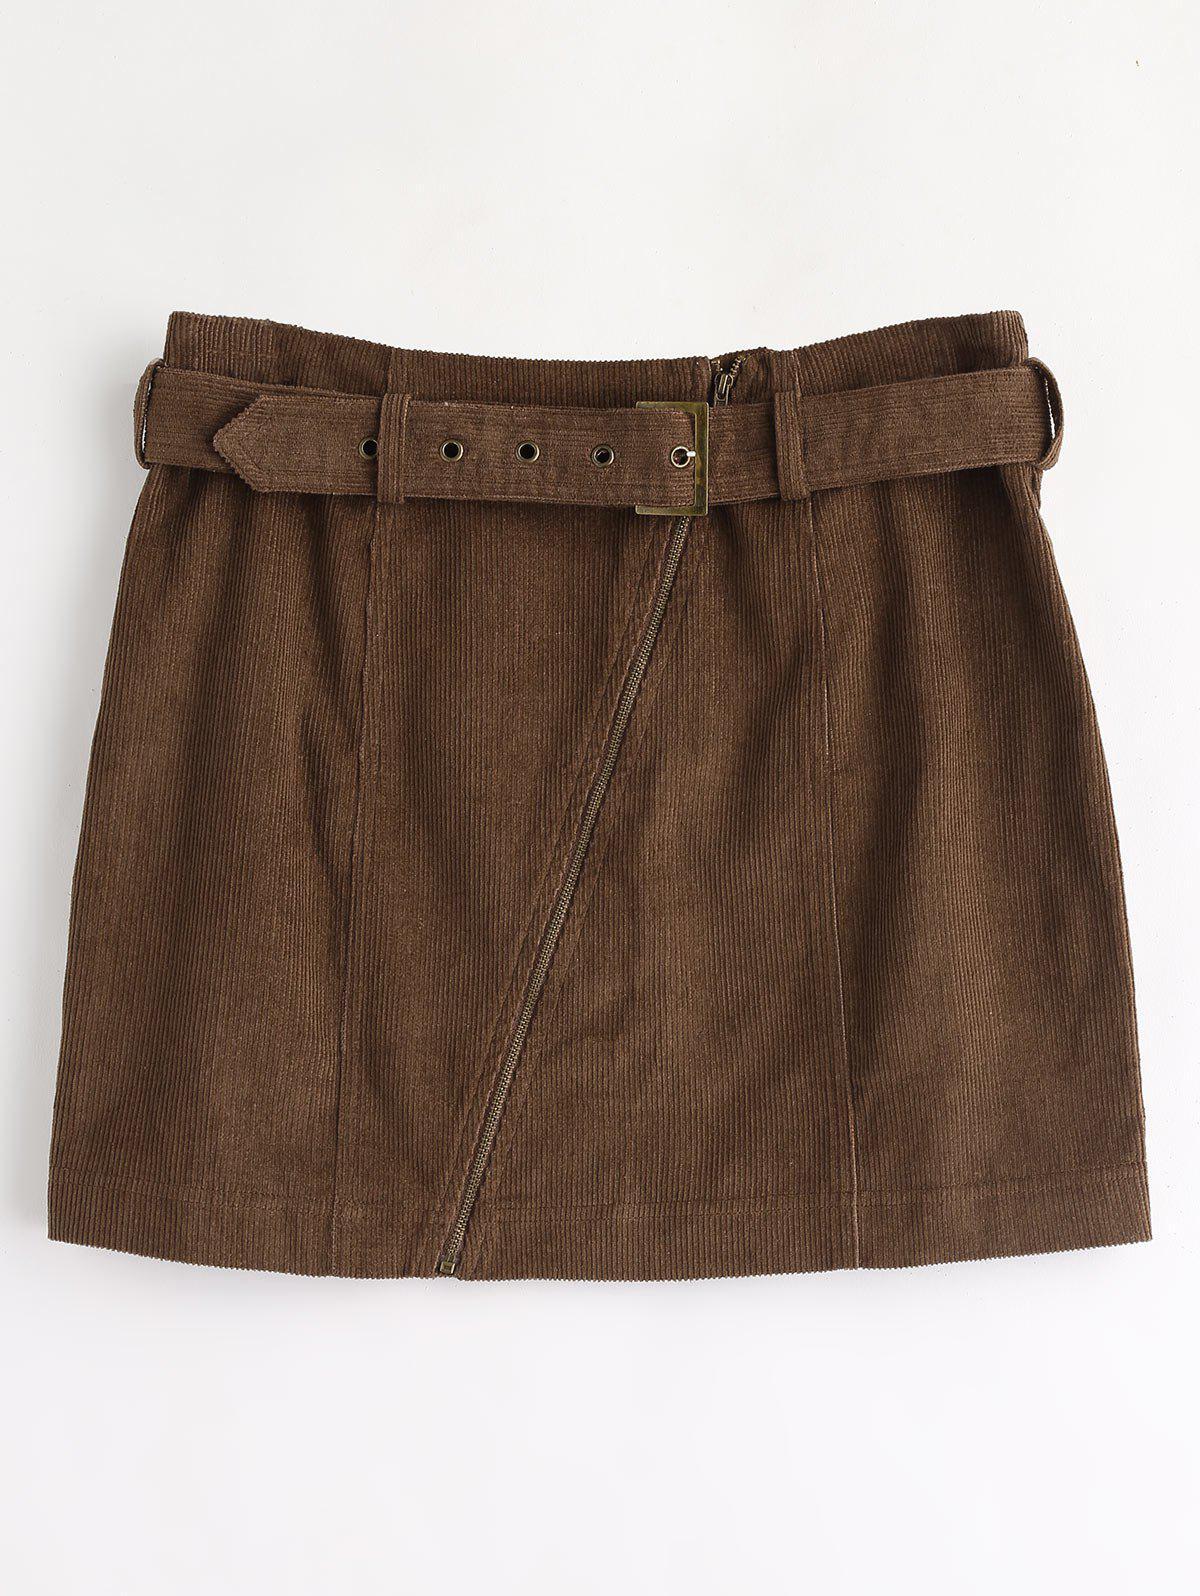 Zaful | DEEP BROWN ZAFUL Corduroy Zip Faux Belt Skirt | Clouty